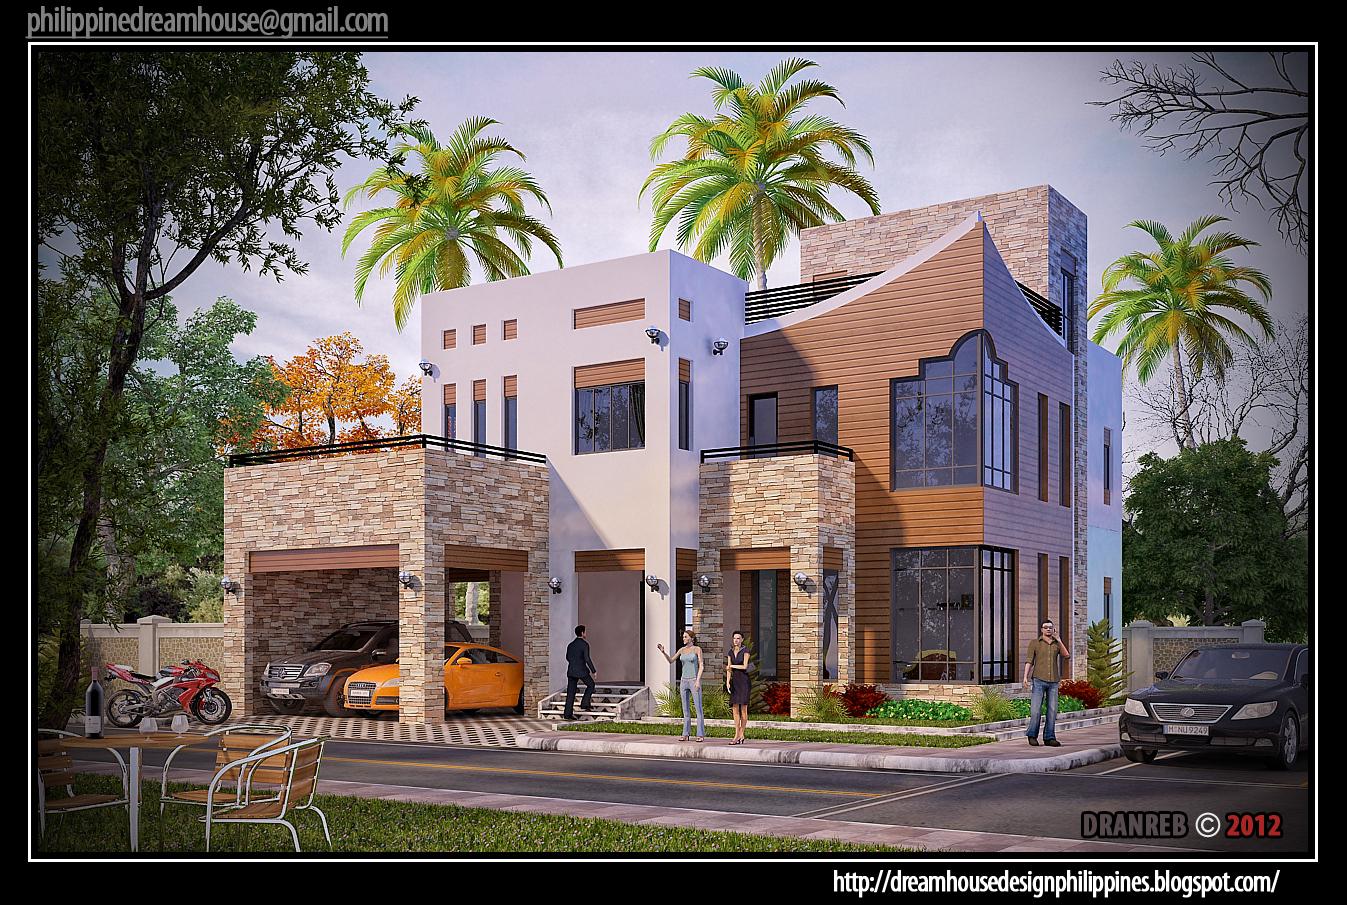 Philippine Dream House Design Two Storey House In Cebu